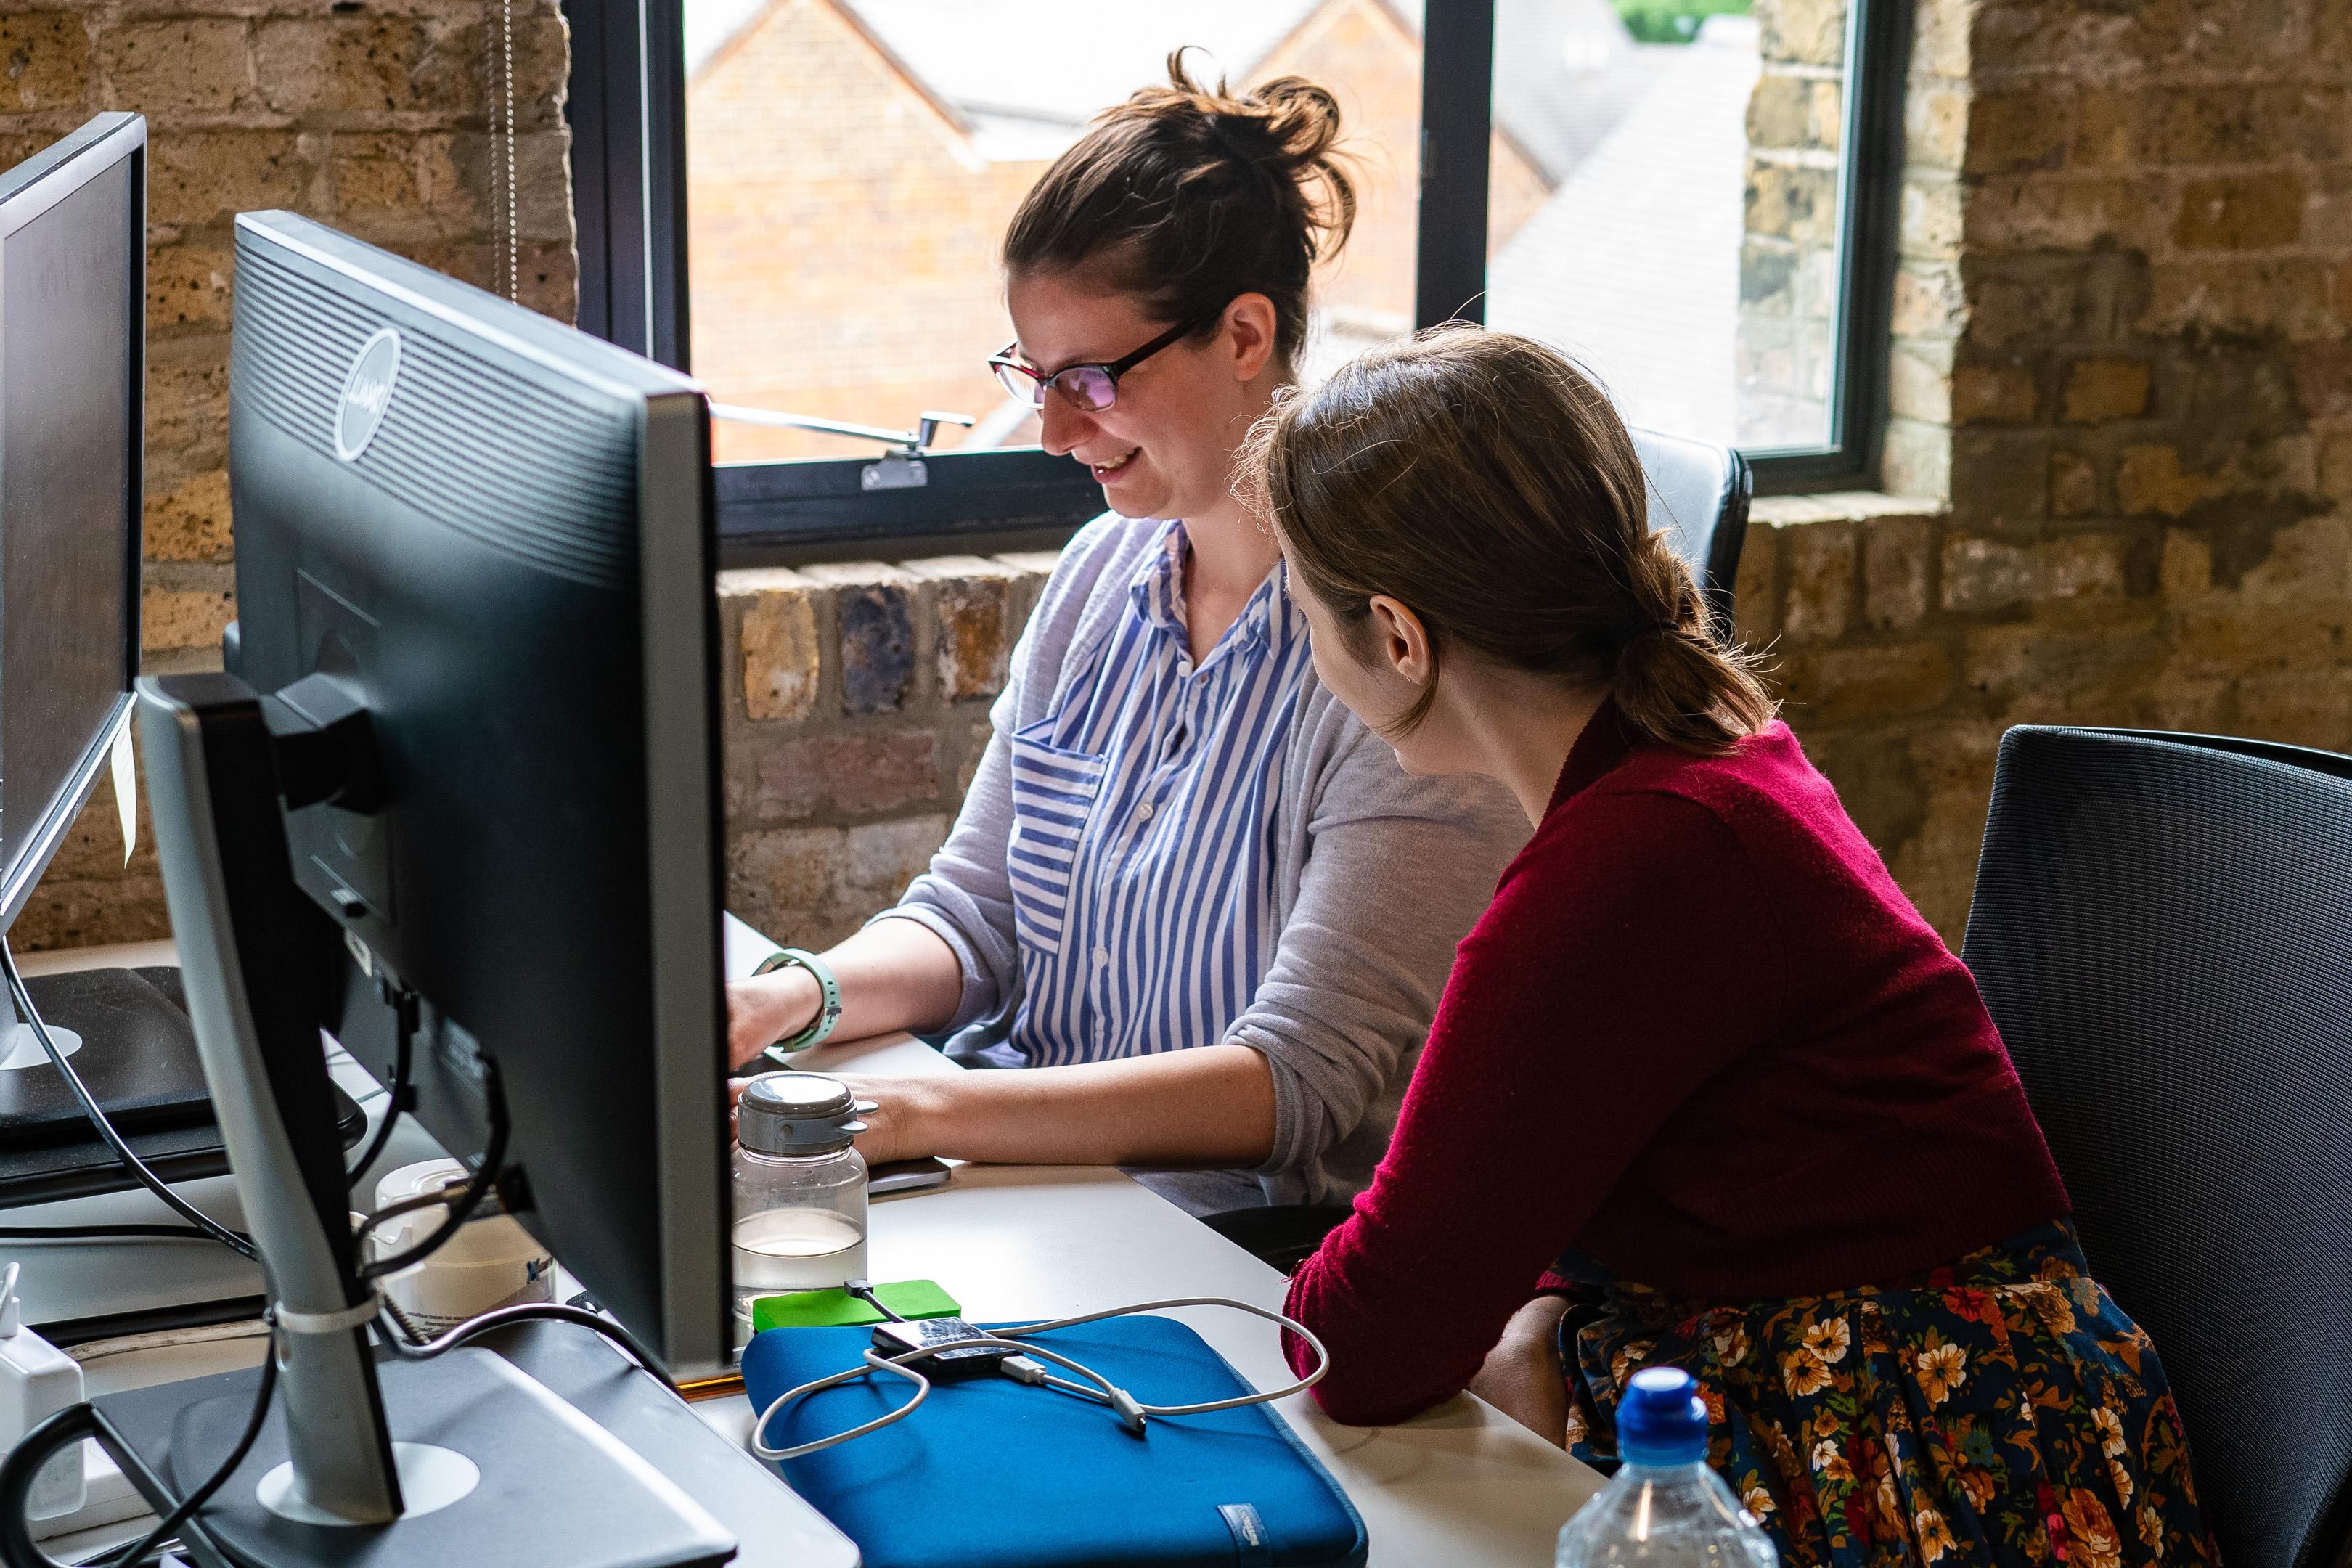 women pair programming